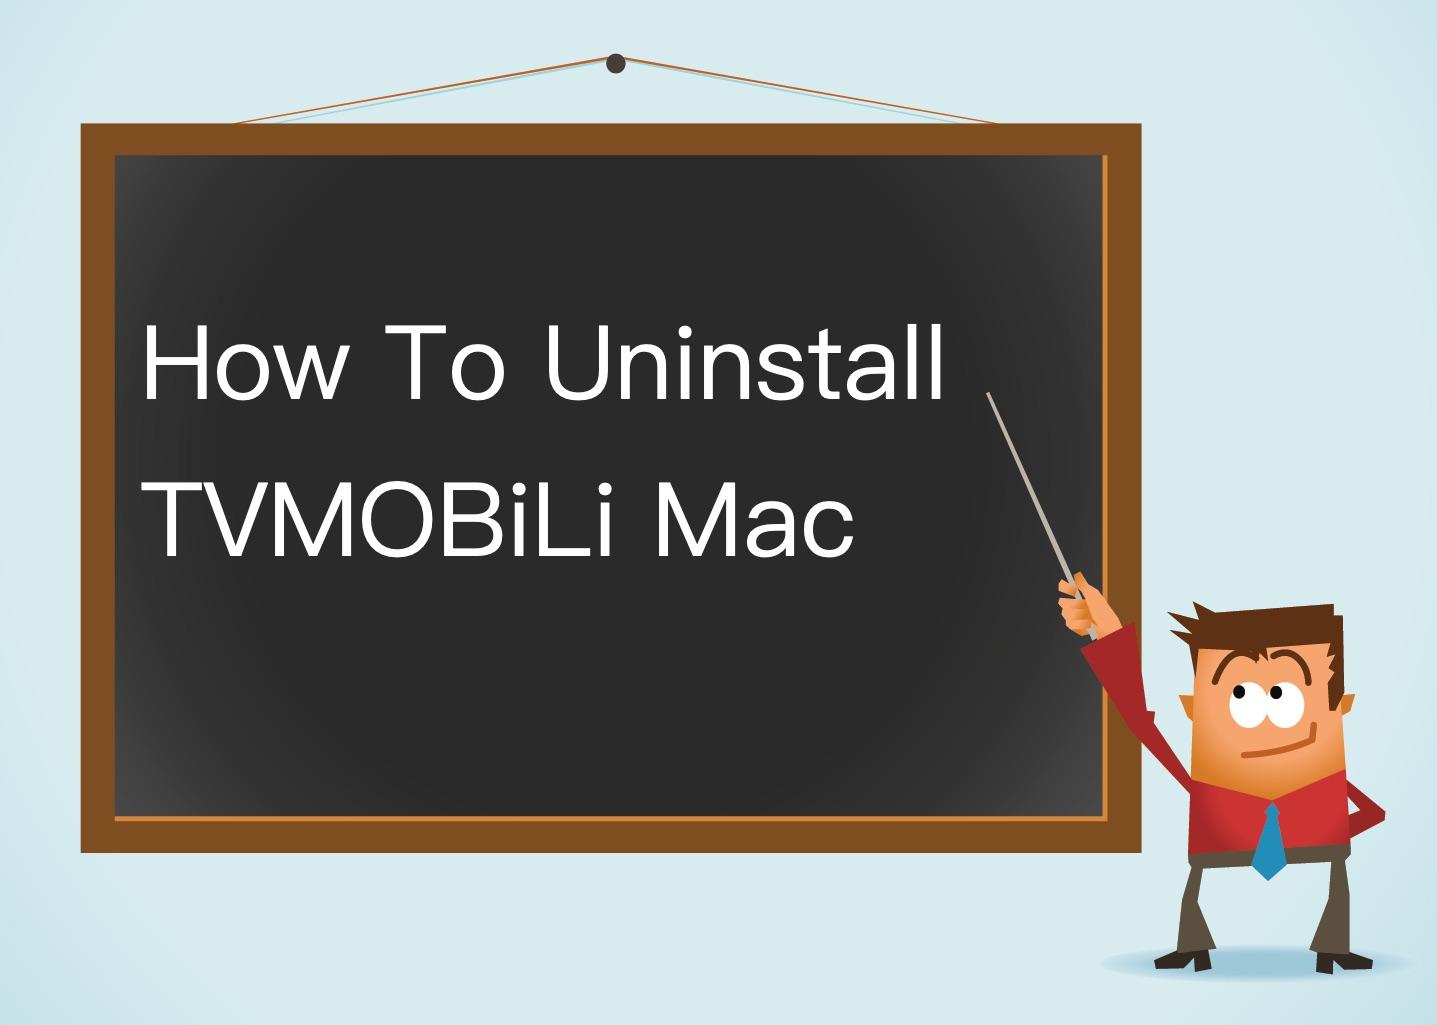 Tv Mobili Mac.Uninstall Tvmobili Mac How To Completely Uninstall Tvmobili